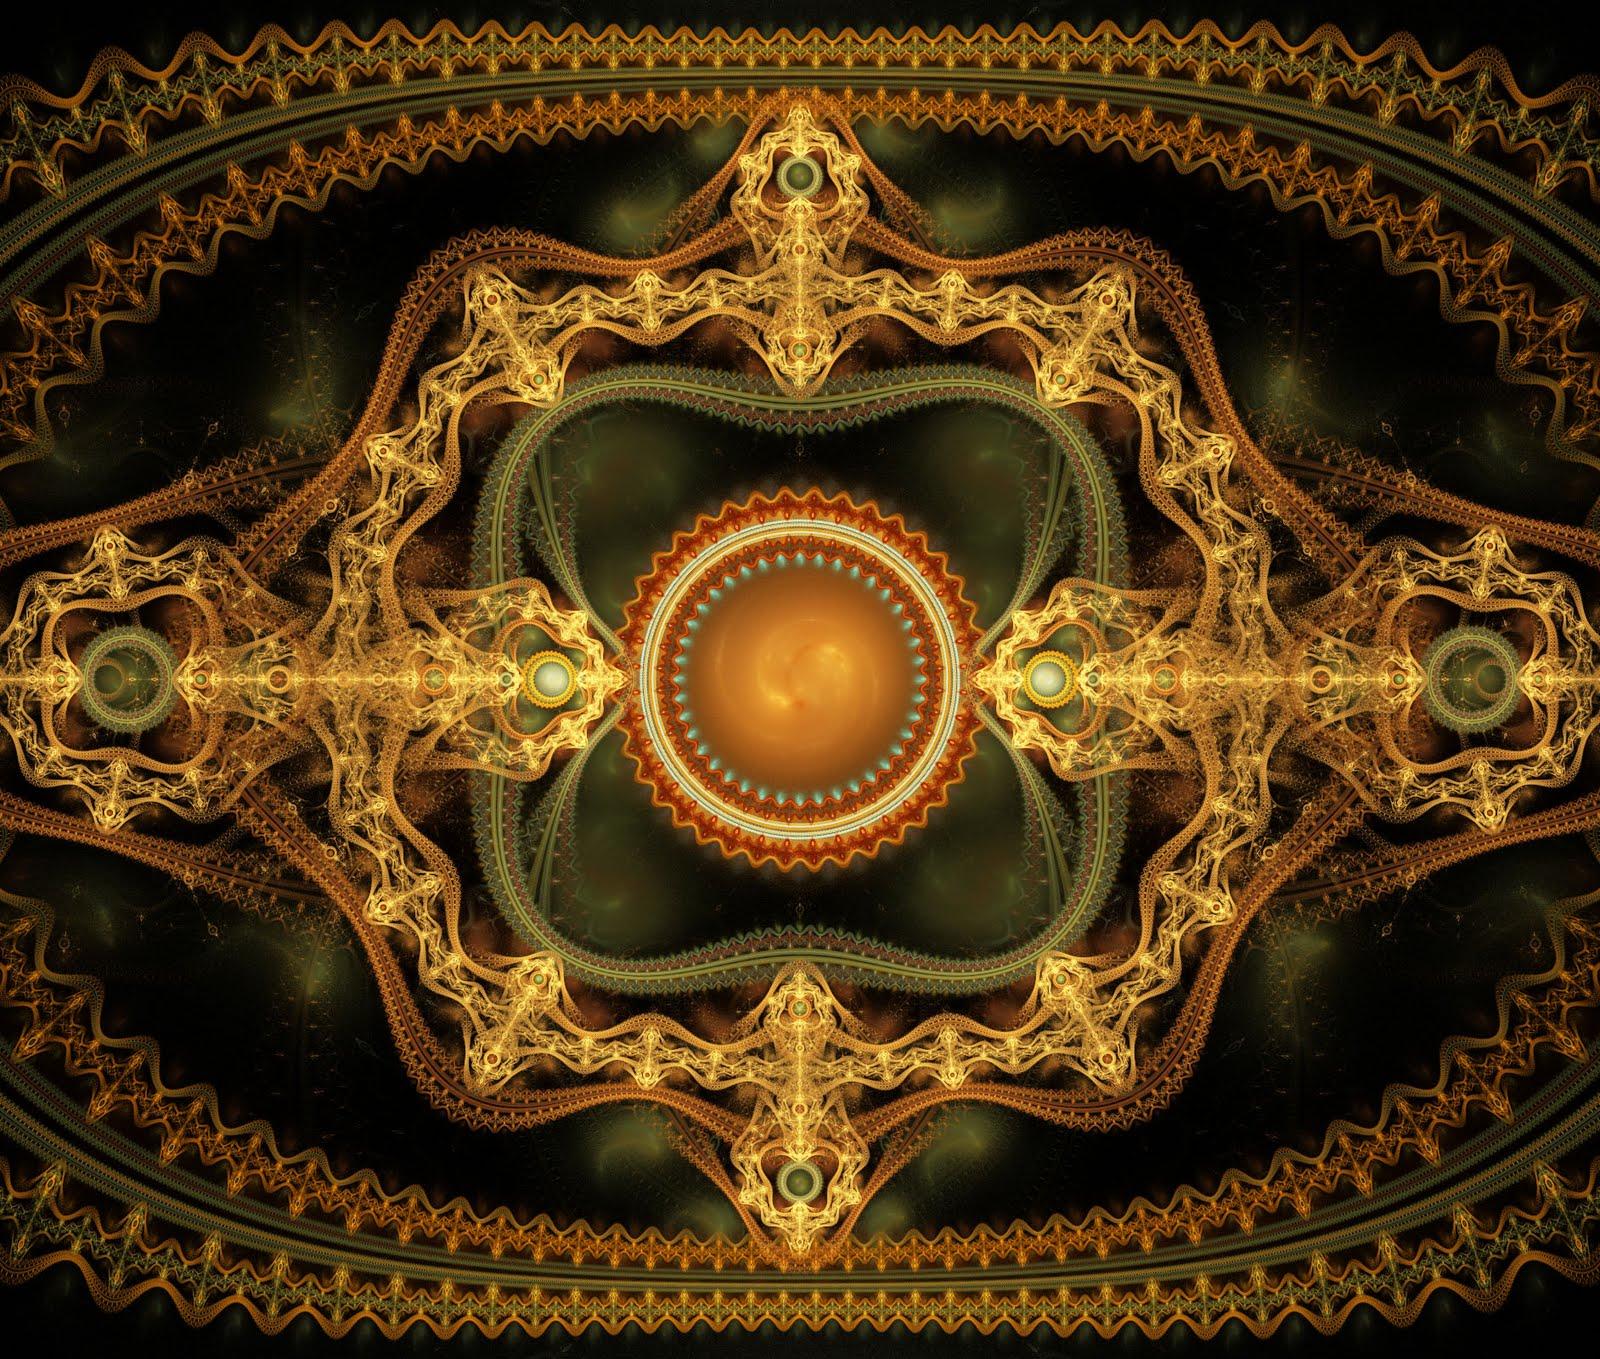 jen u0026 39 s art blog  rroject 3  u2013 embracing the digital aesthetic